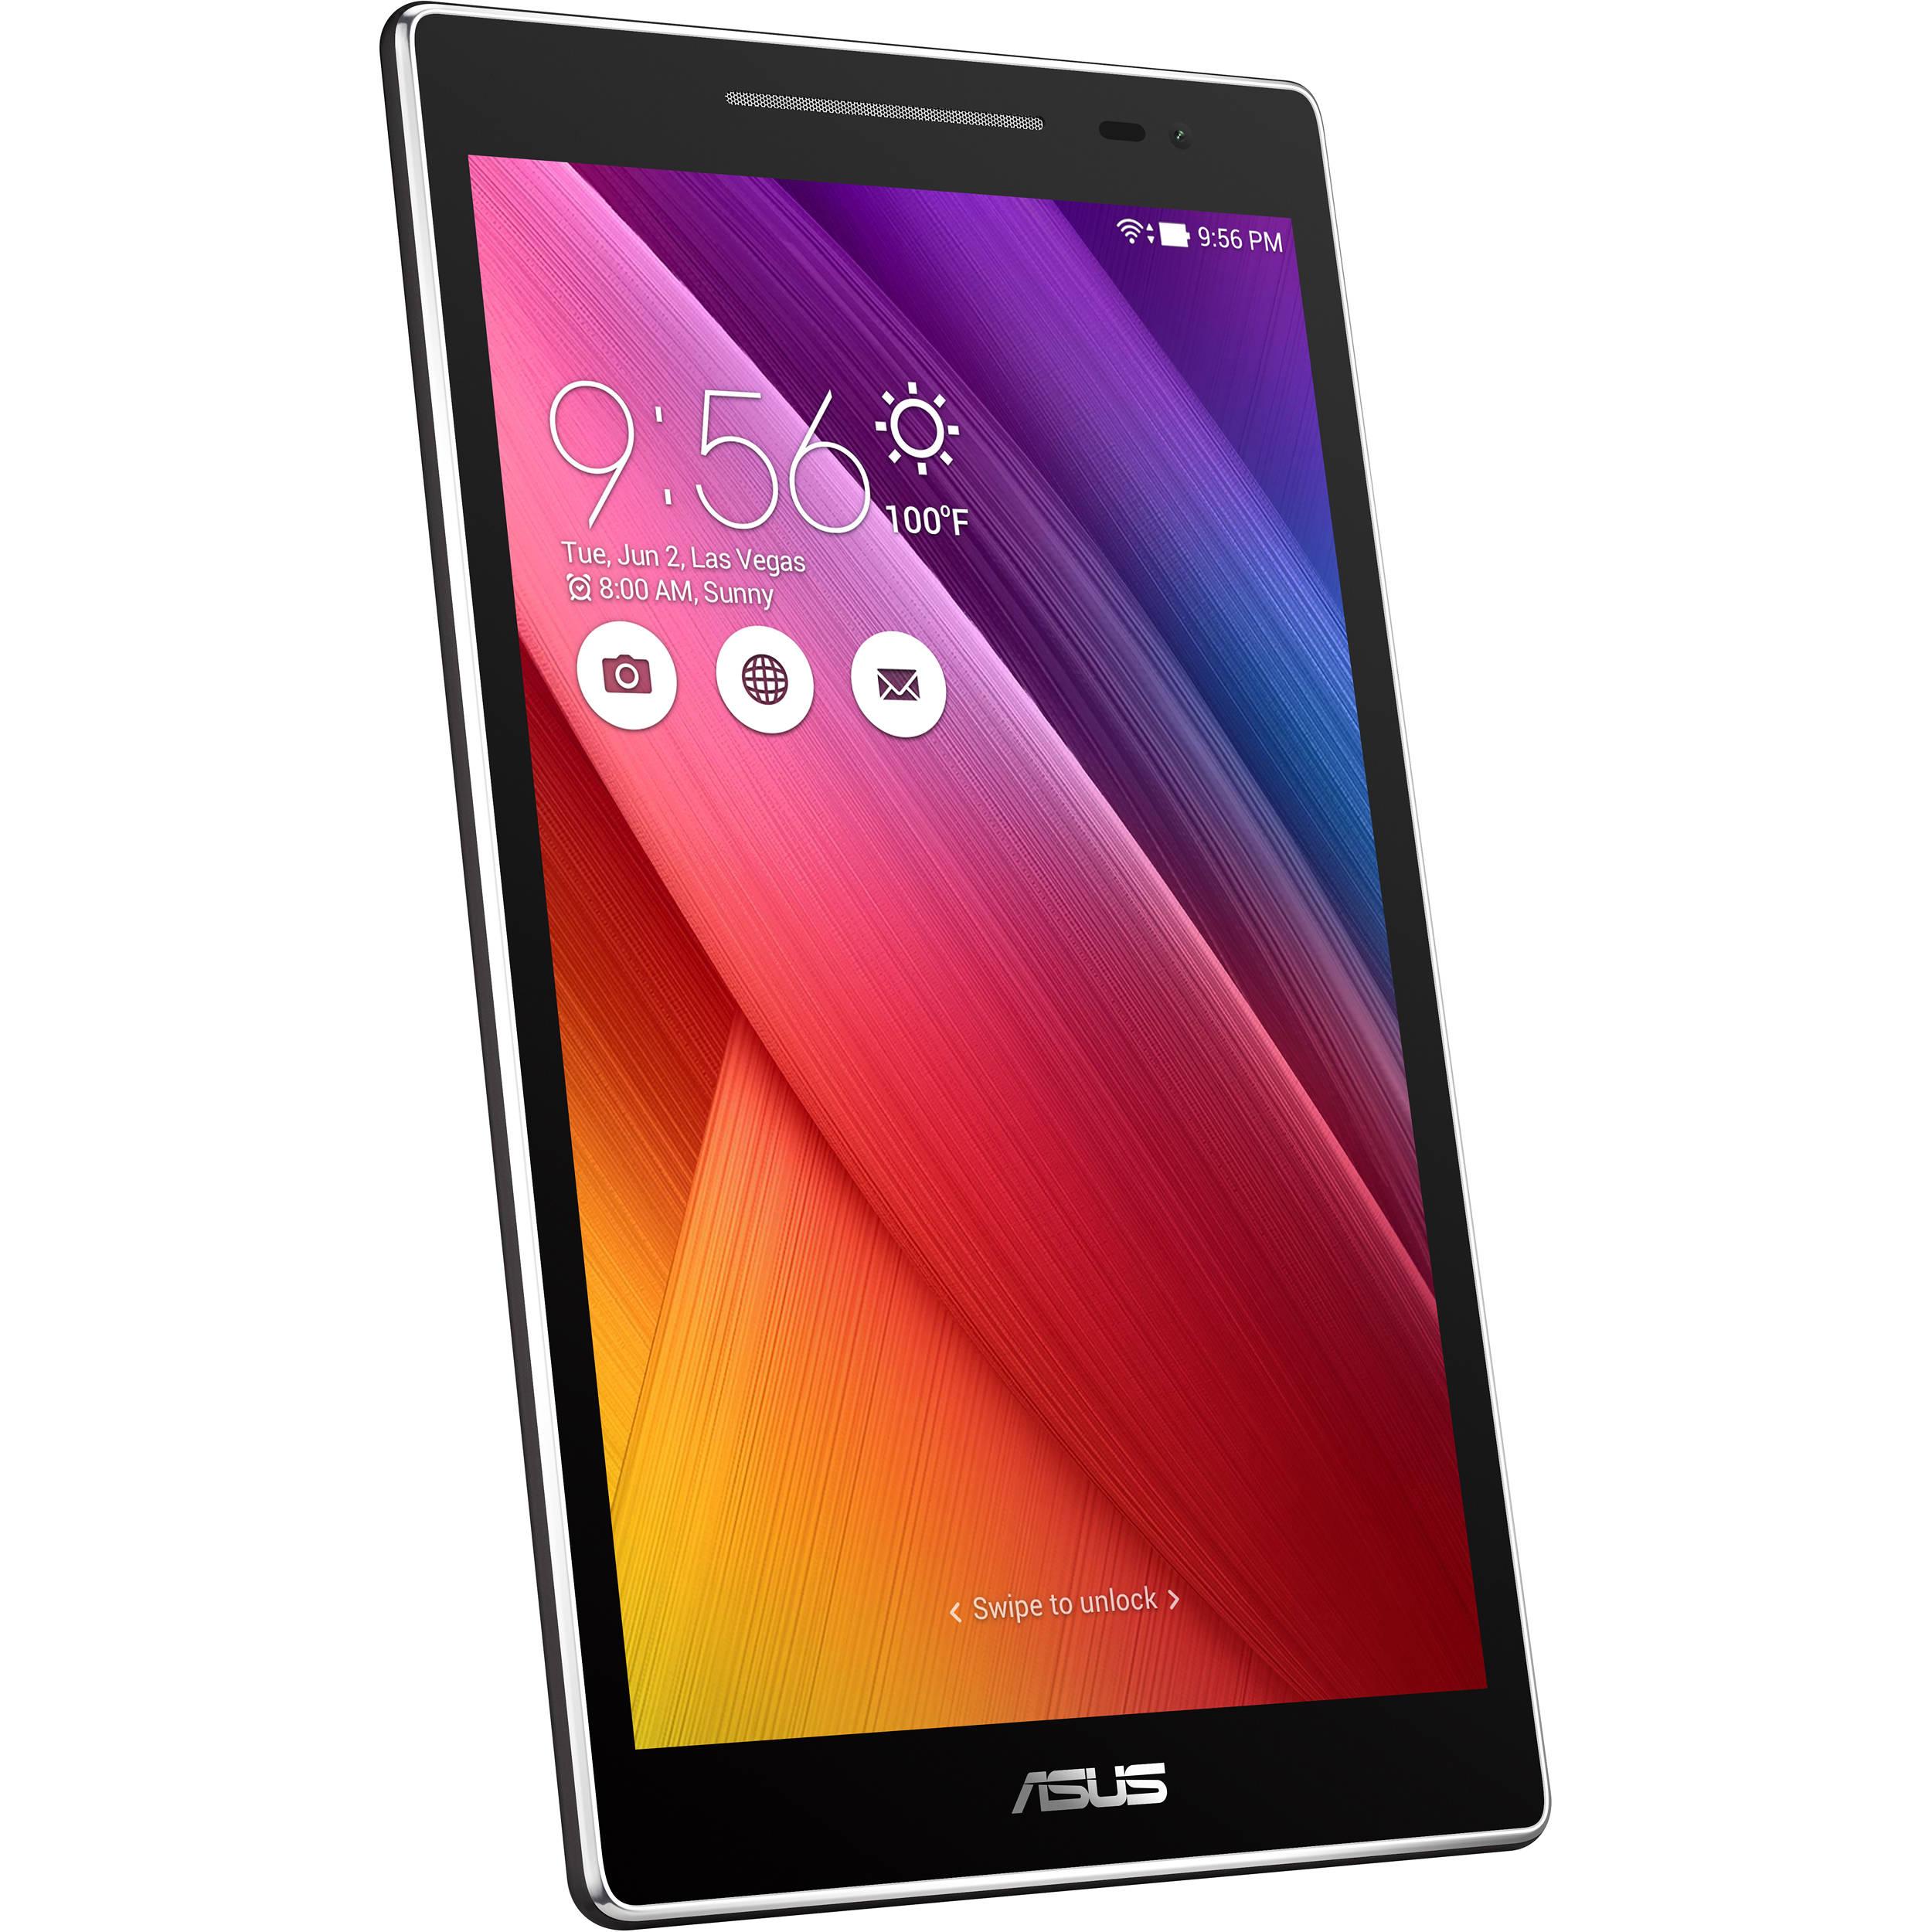 Fabulous Asus 8 Zenpad 8 0 Z380M 16Gb Tablet Wi Fi Dark Gray Download Free Architecture Designs Scobabritishbridgeorg